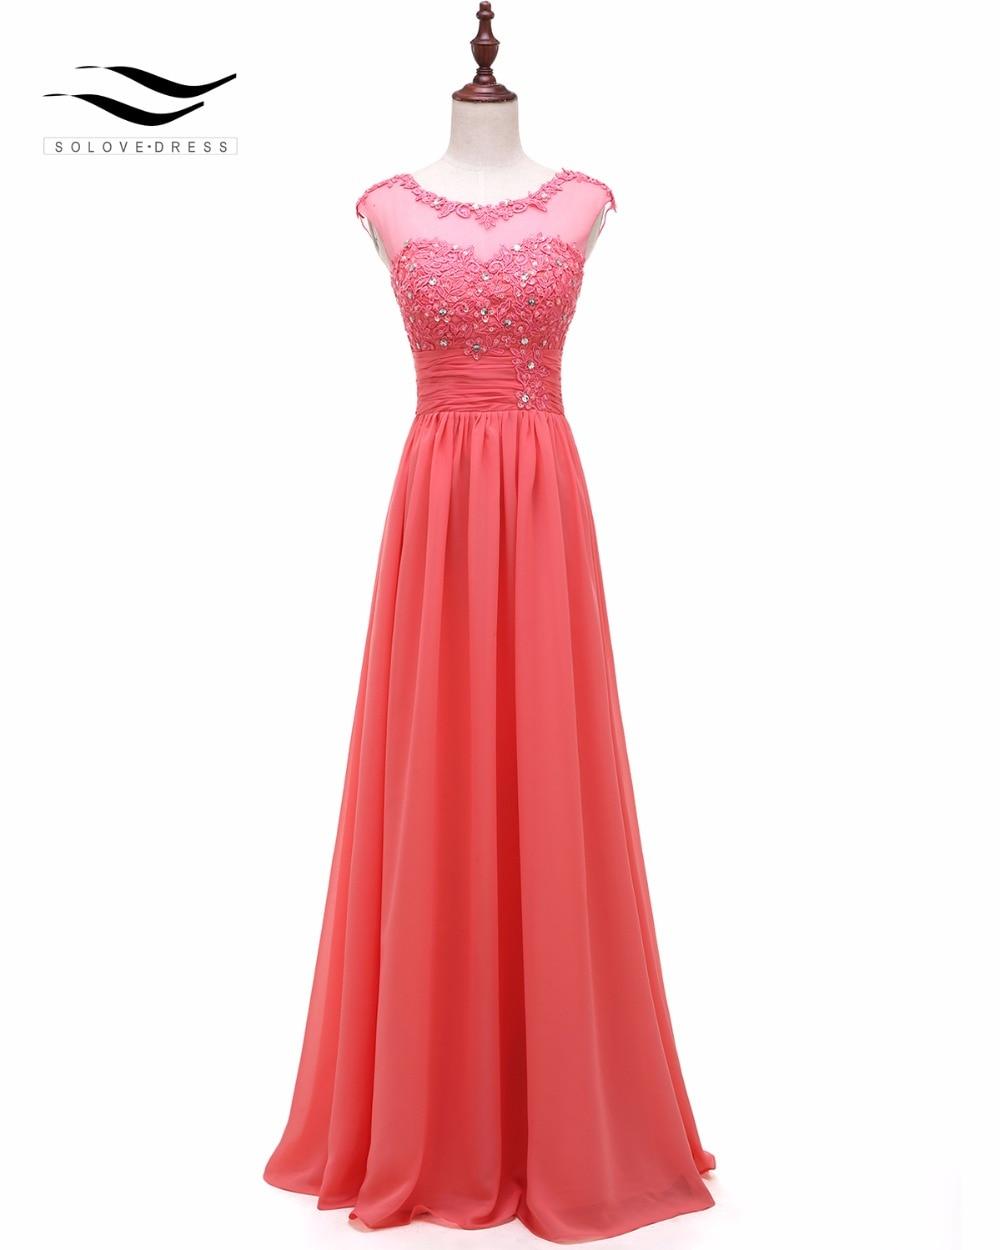 Solovedress Appliques Real Photos Cap Sleeves Beaded A Line Bridesmaid Dress Pleat Gown Elegant Vestidos De Fiesta PV20002